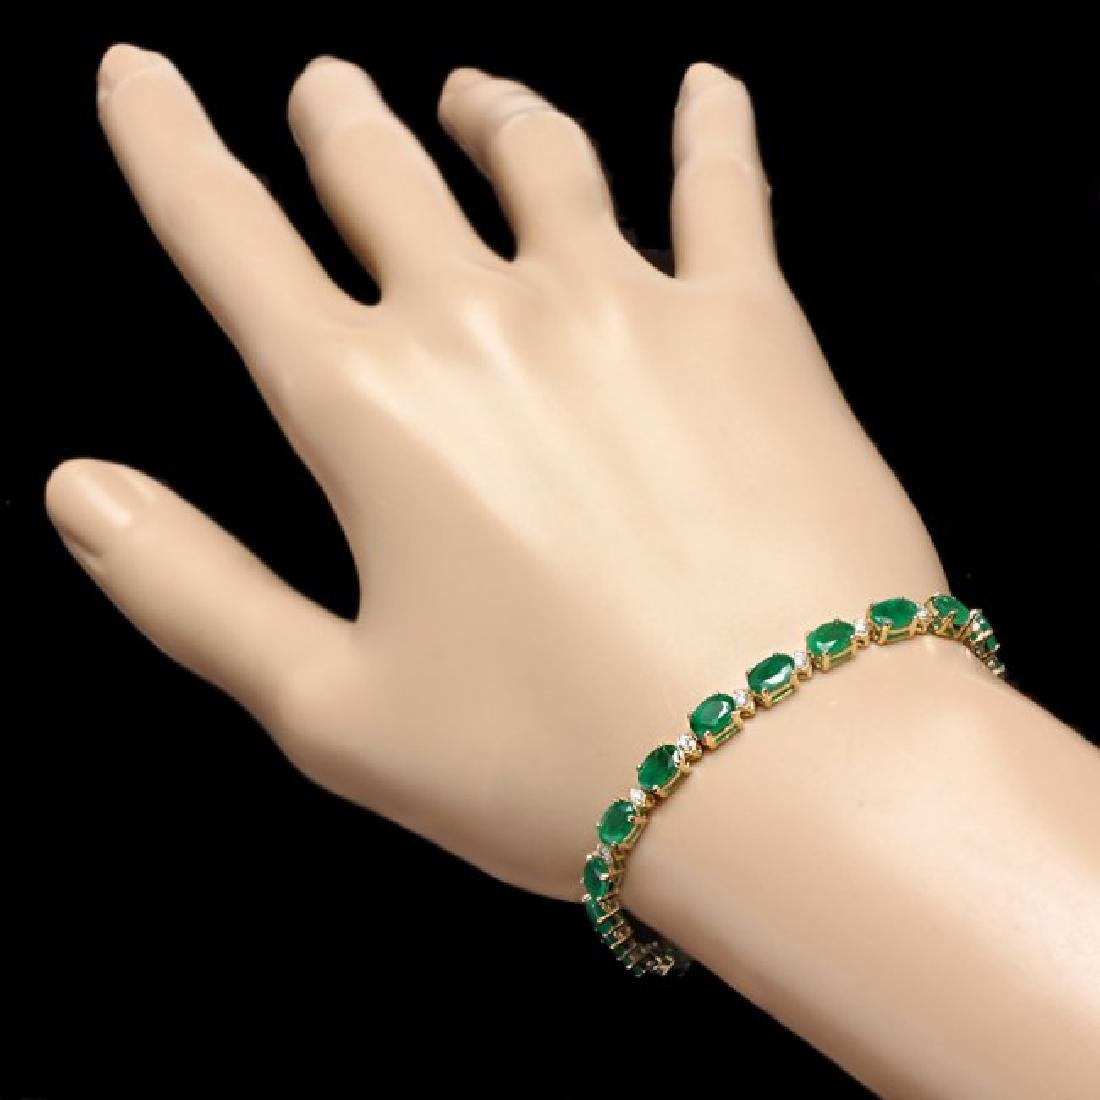 14k Gold 10ct Emerald 0.60ct Diamond Bracelet - 4